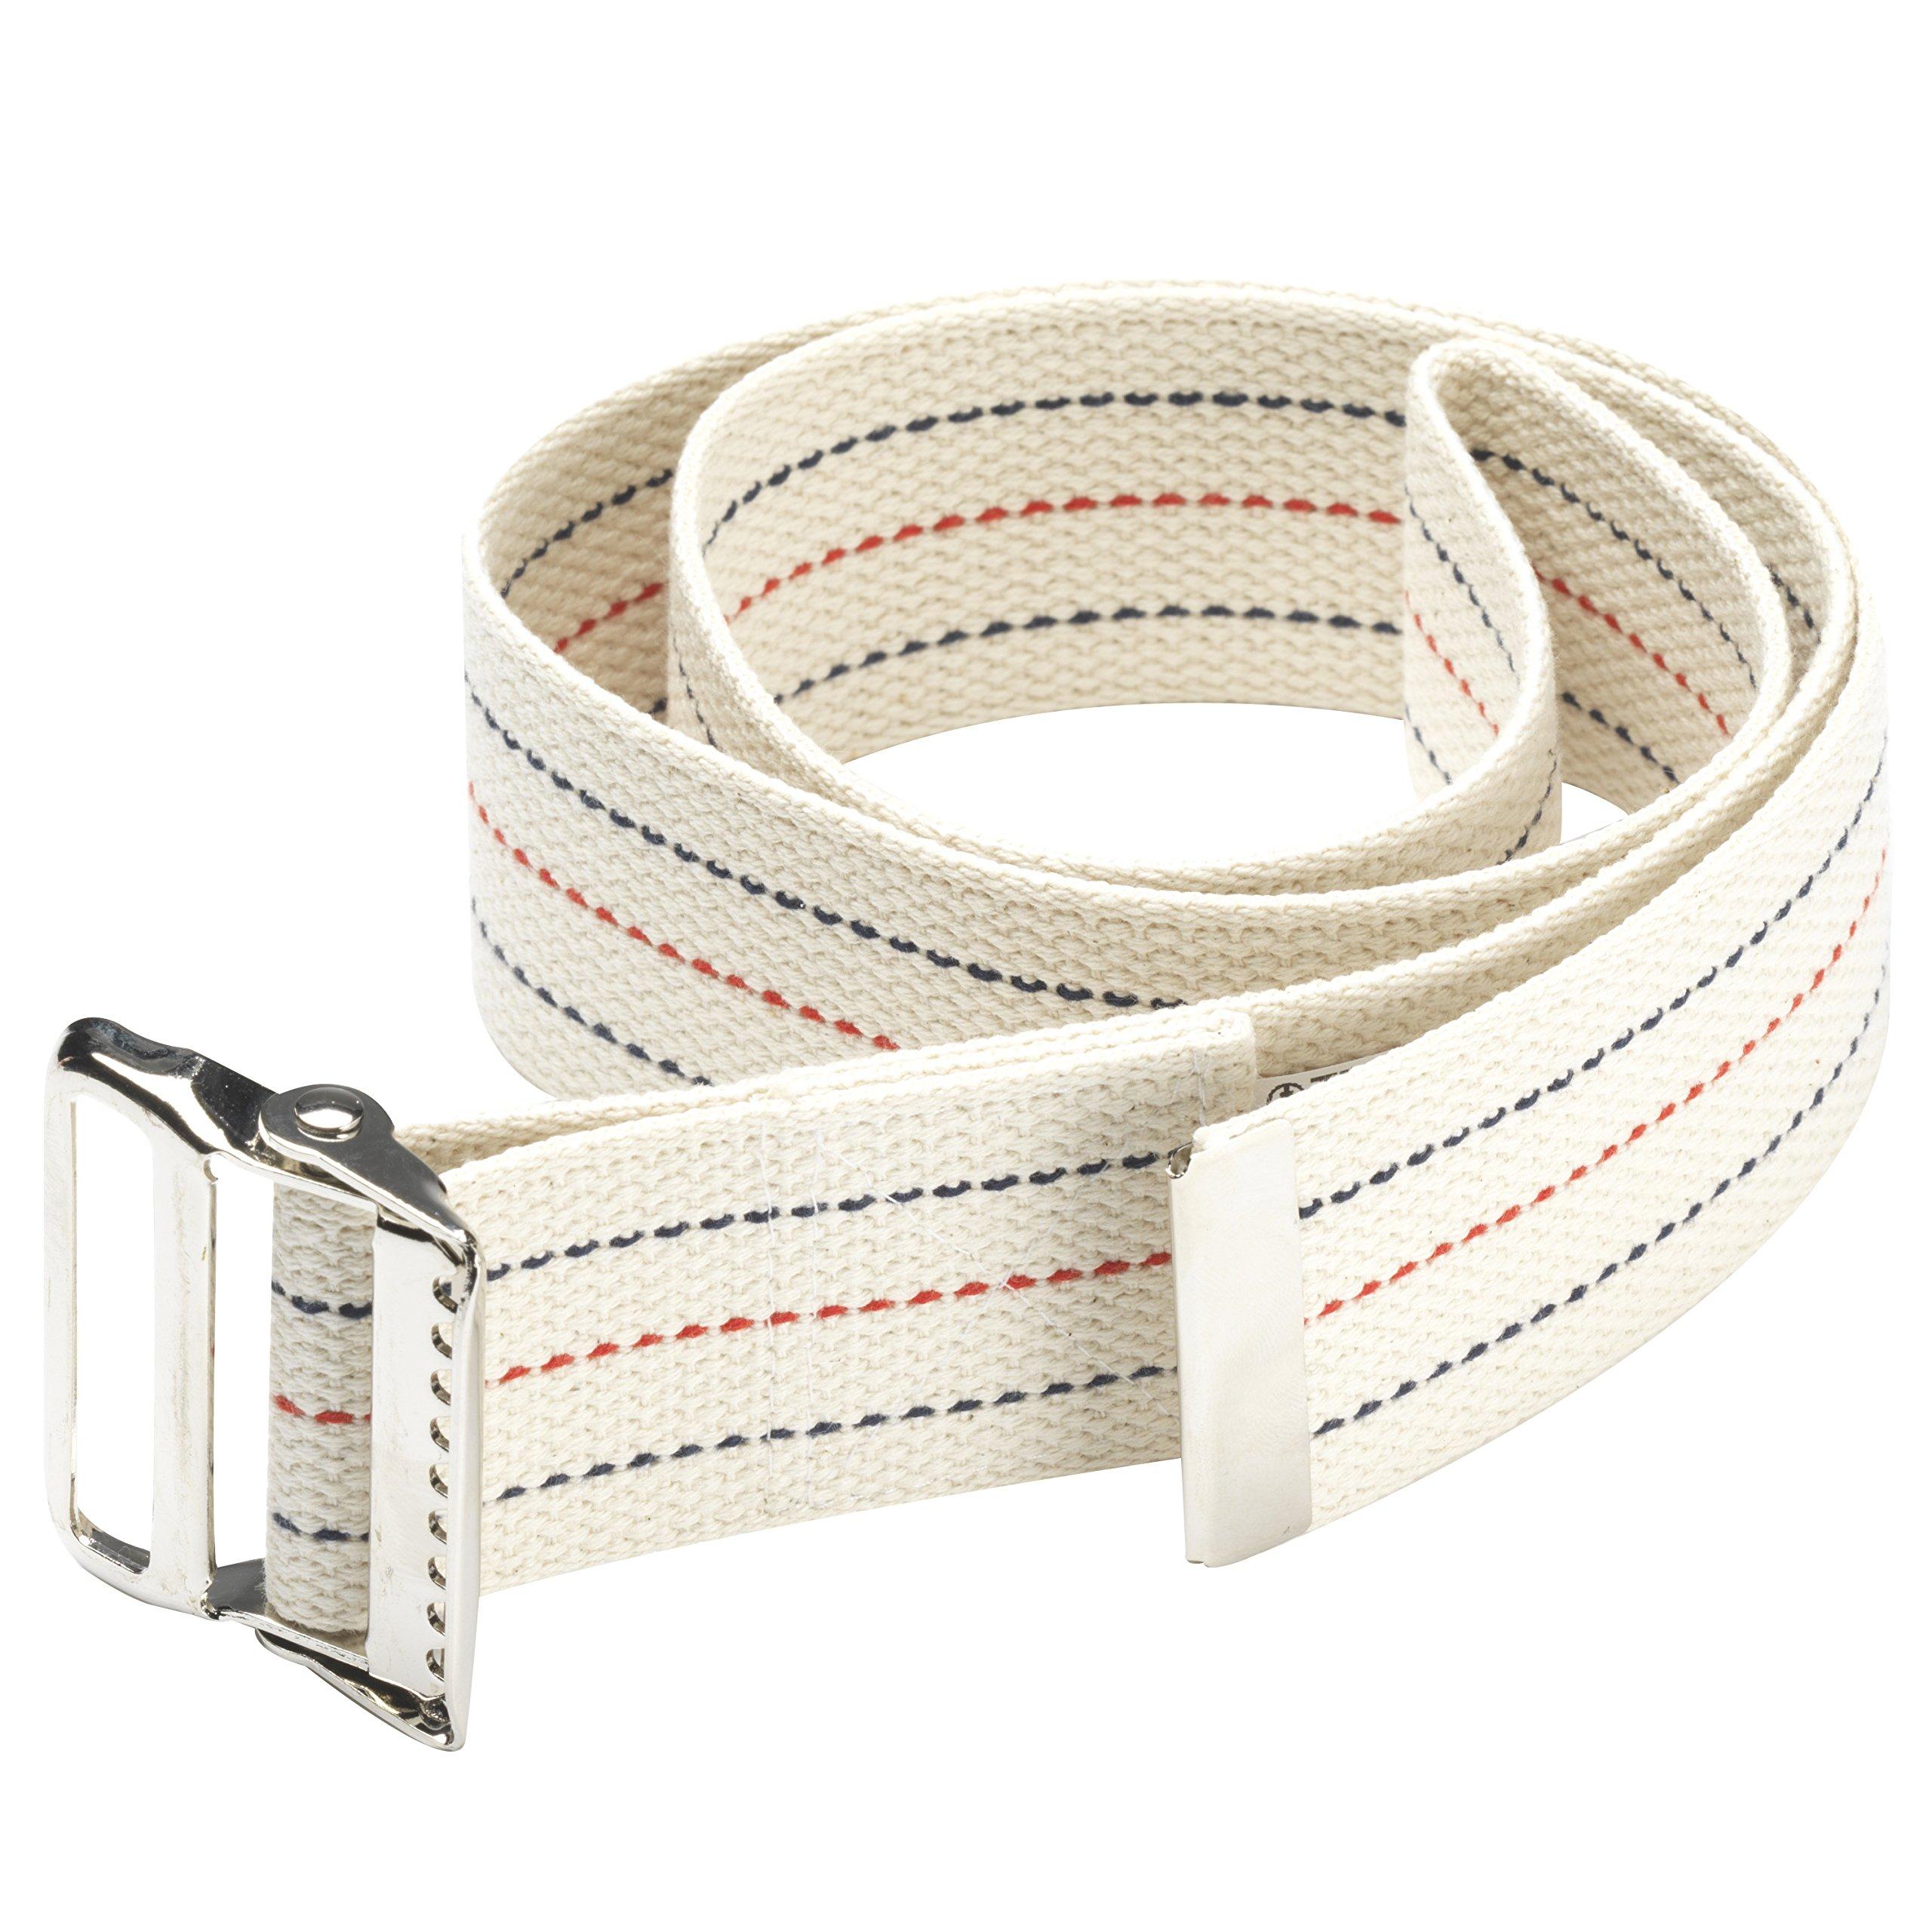 OTC Gait Transfer Belt Support Hold for Caregiver, White, 60 inch